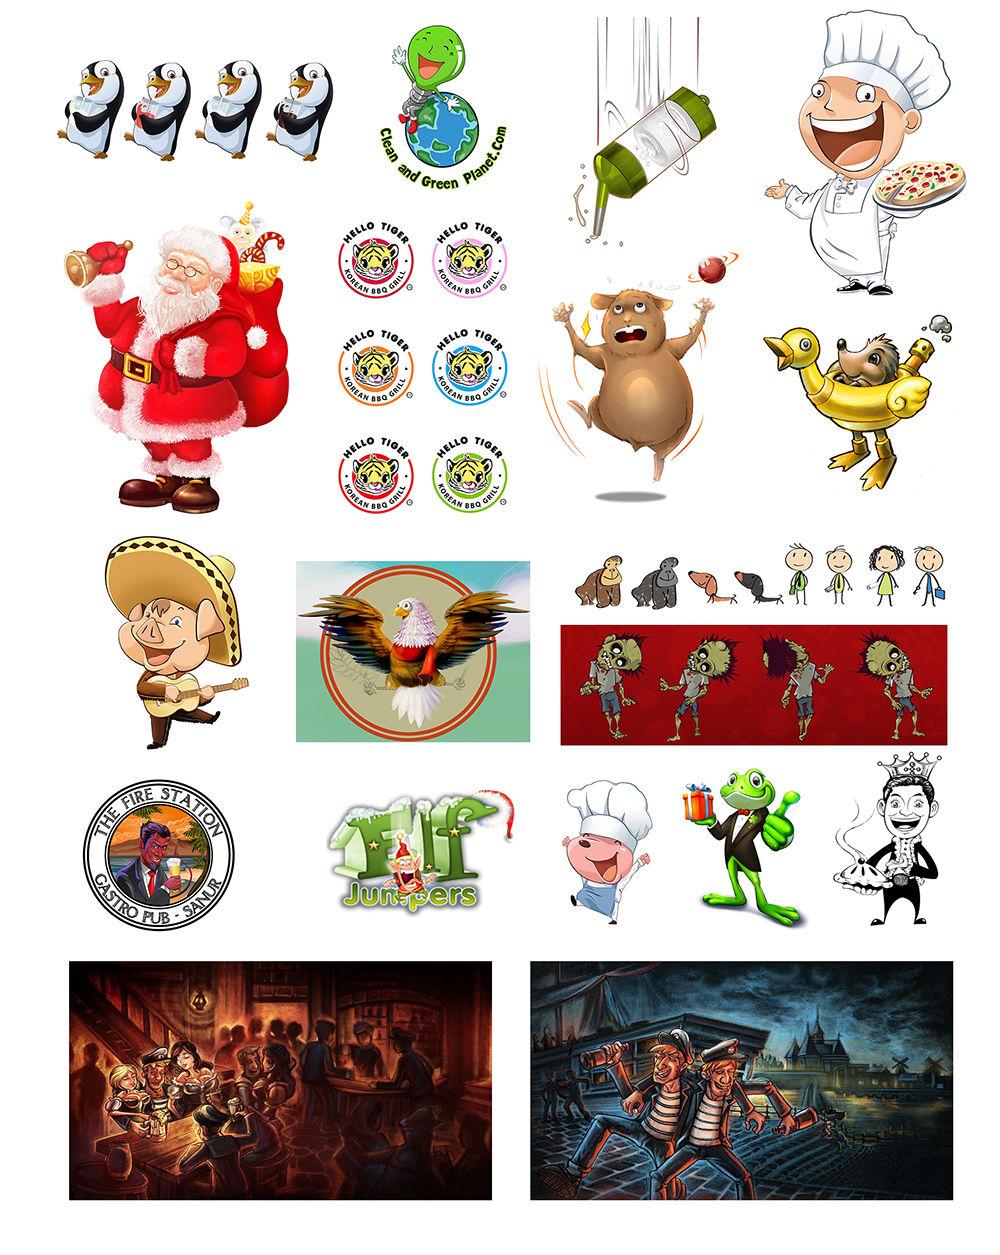 Mascottes, logos, cartoons